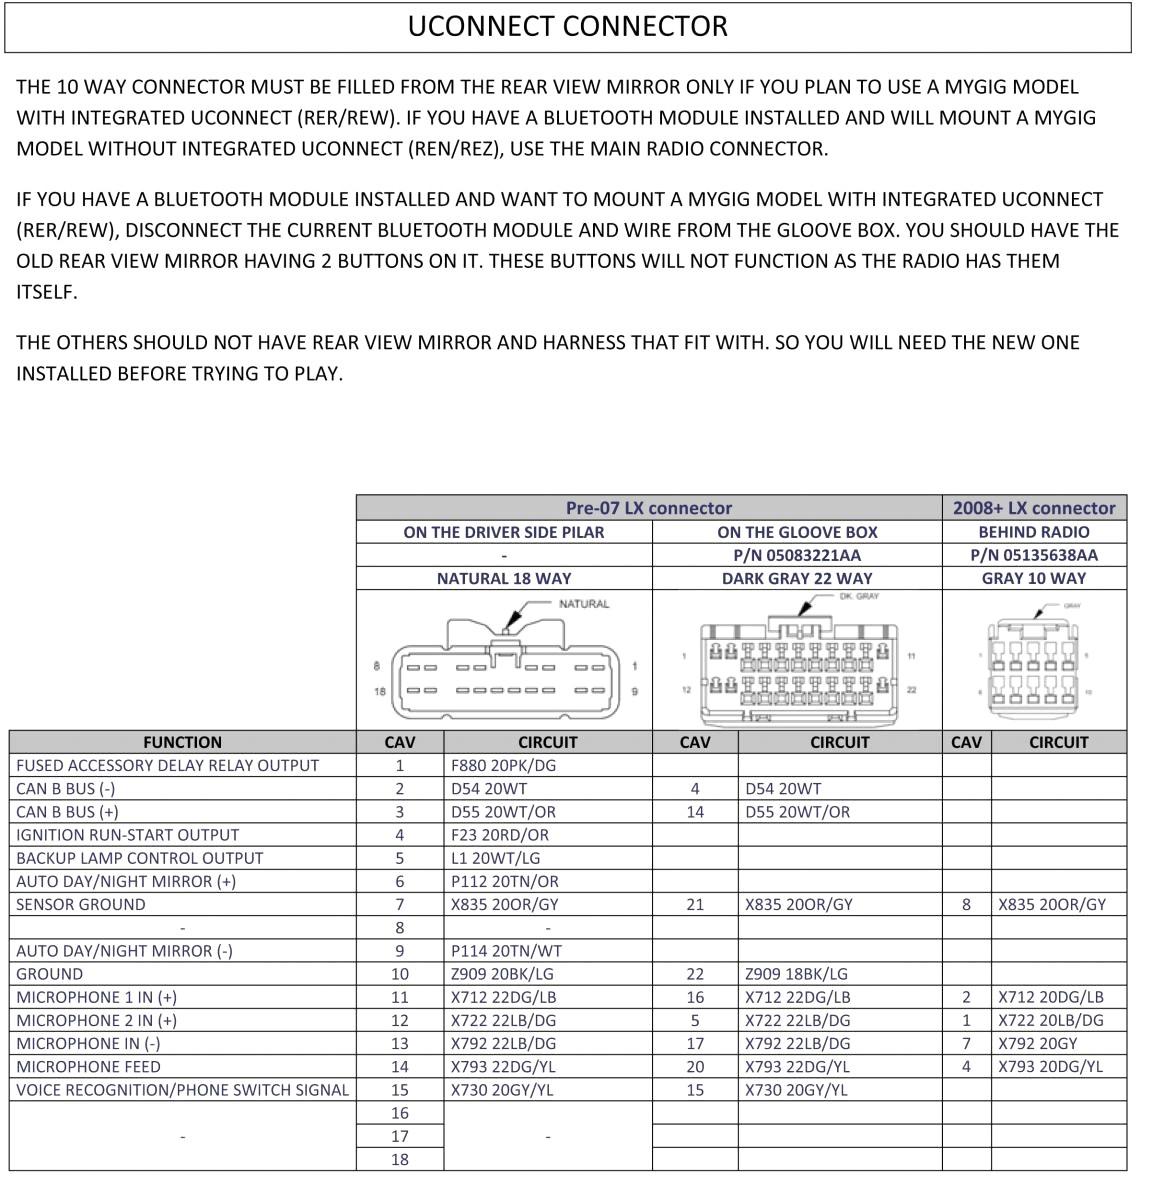 chrysler wiring diagram m2 14 bk yl 3 phase star delta 1999 sebring radio best library 2005 gallery 18k